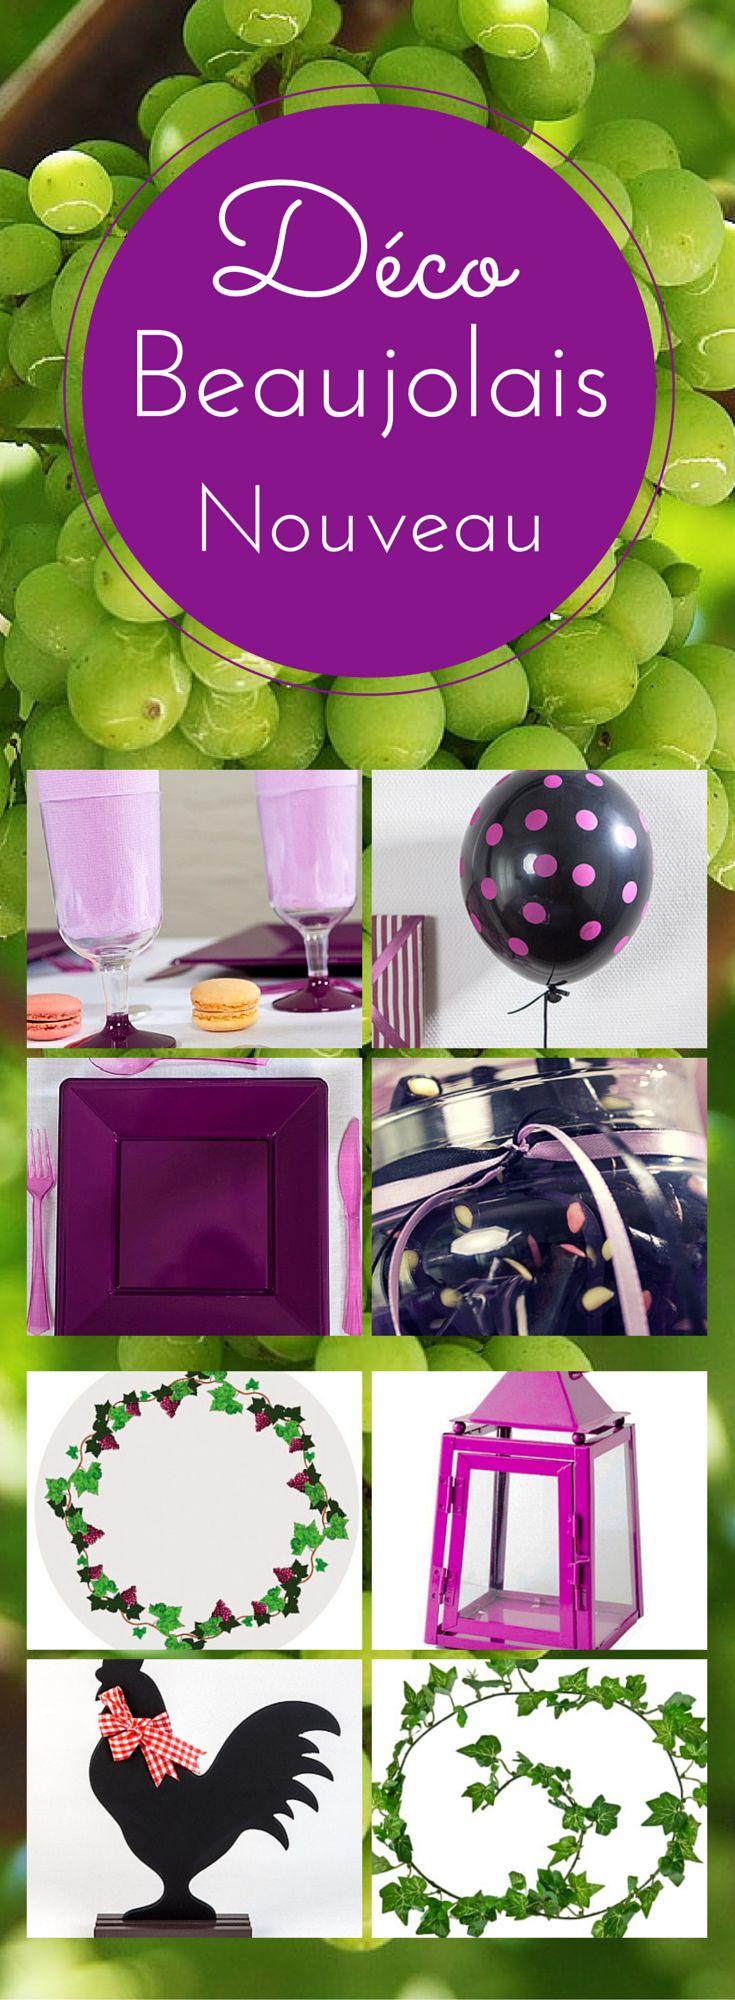 17 Best Images About Dco Beaujolais Nouveau On Pinterest Satin Roses And Violets